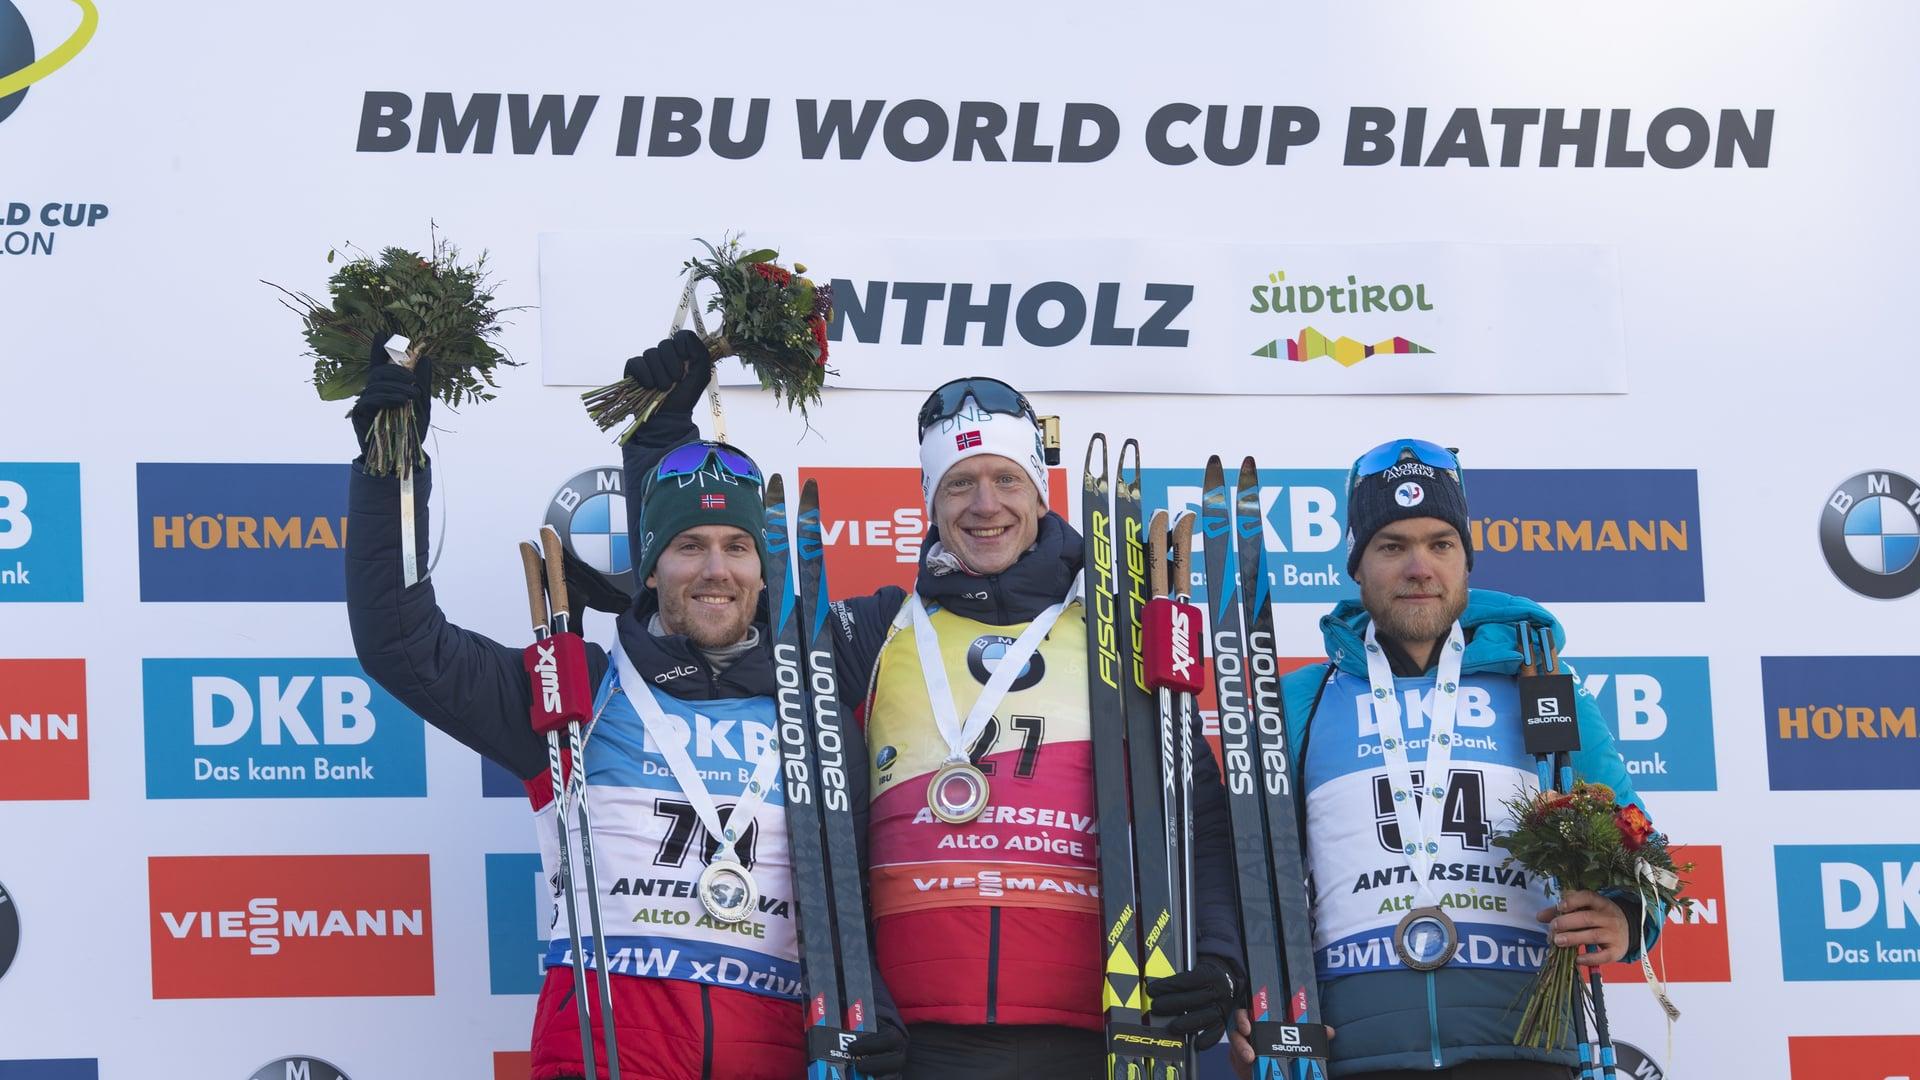 25.01.2019 - Johannes Thingnes Bø ist auch im Antholz-Sprint unschlagbar